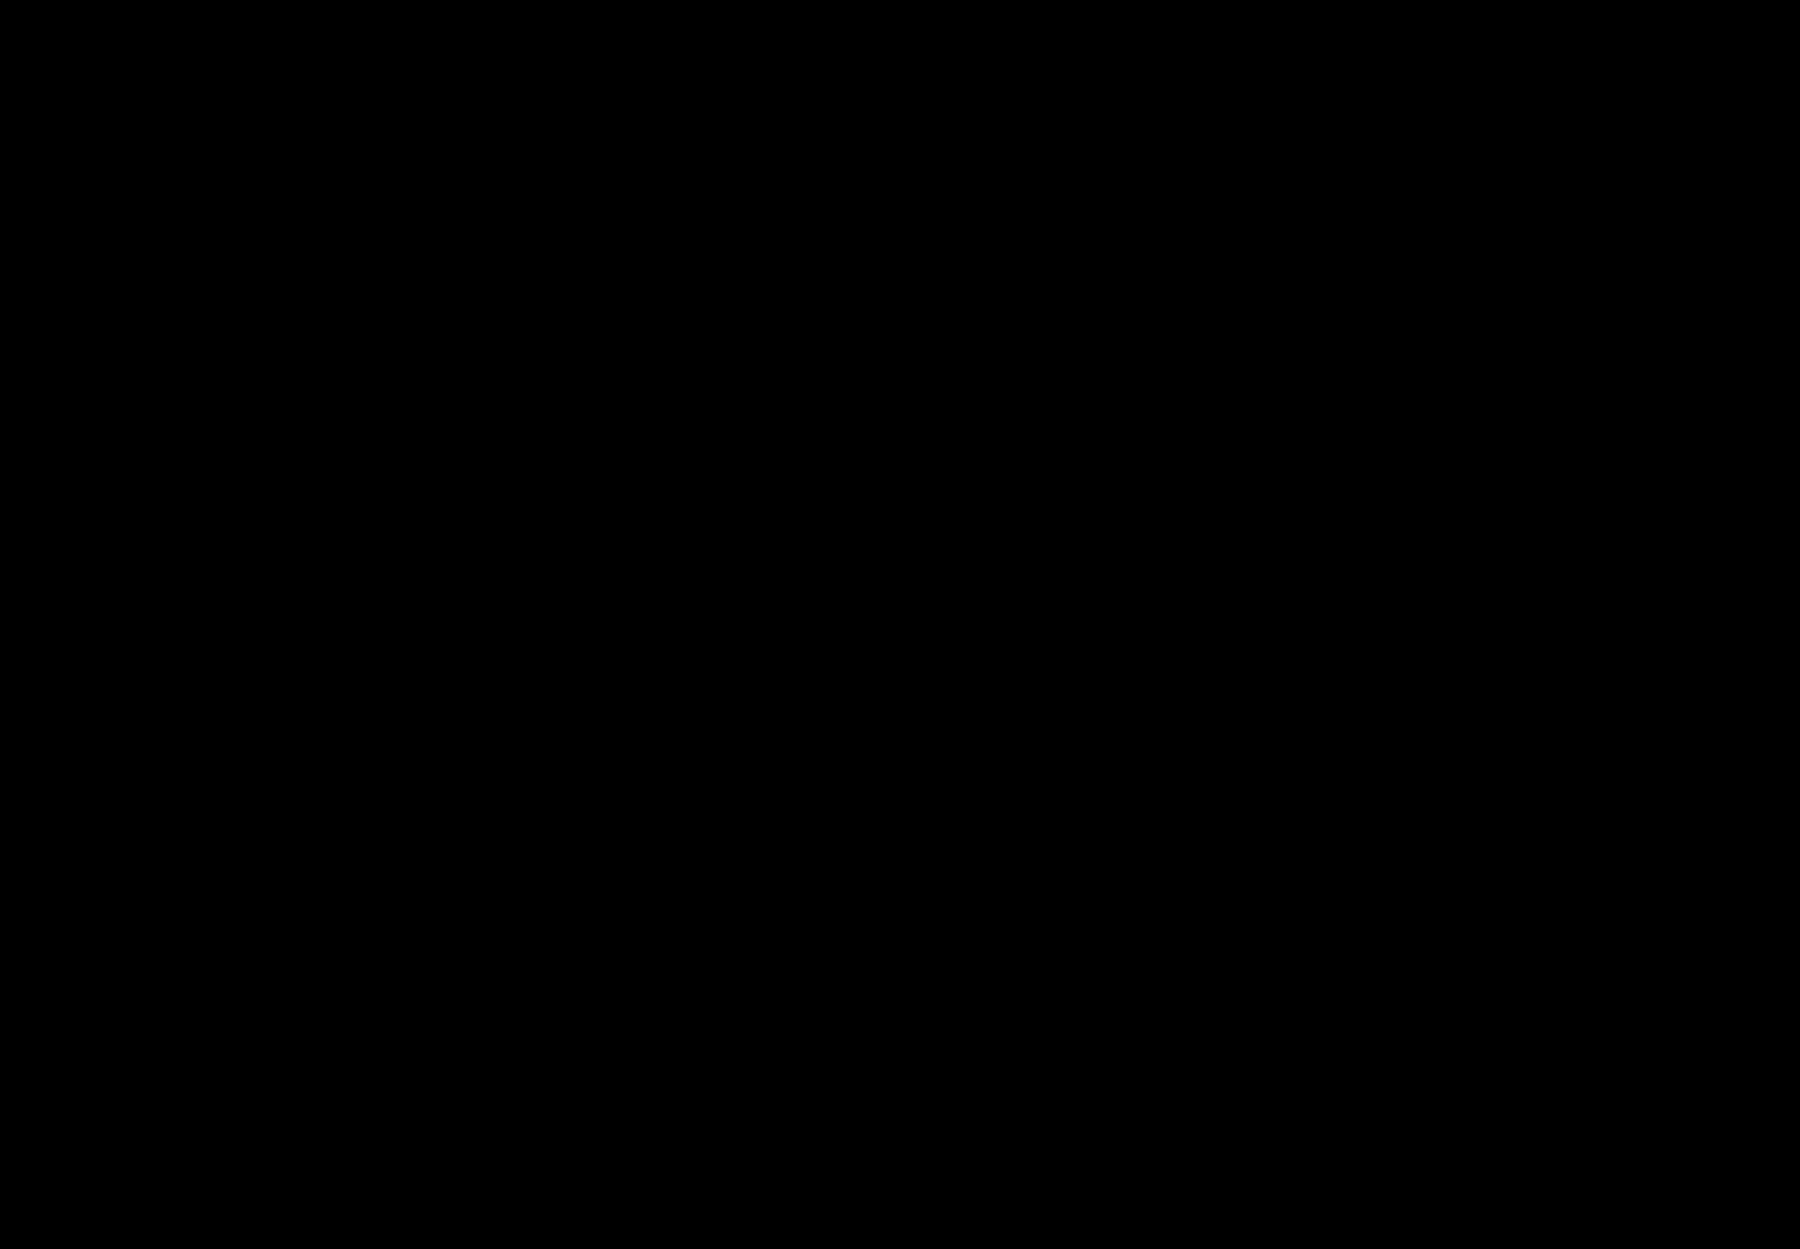 refuelgroup-2-sml